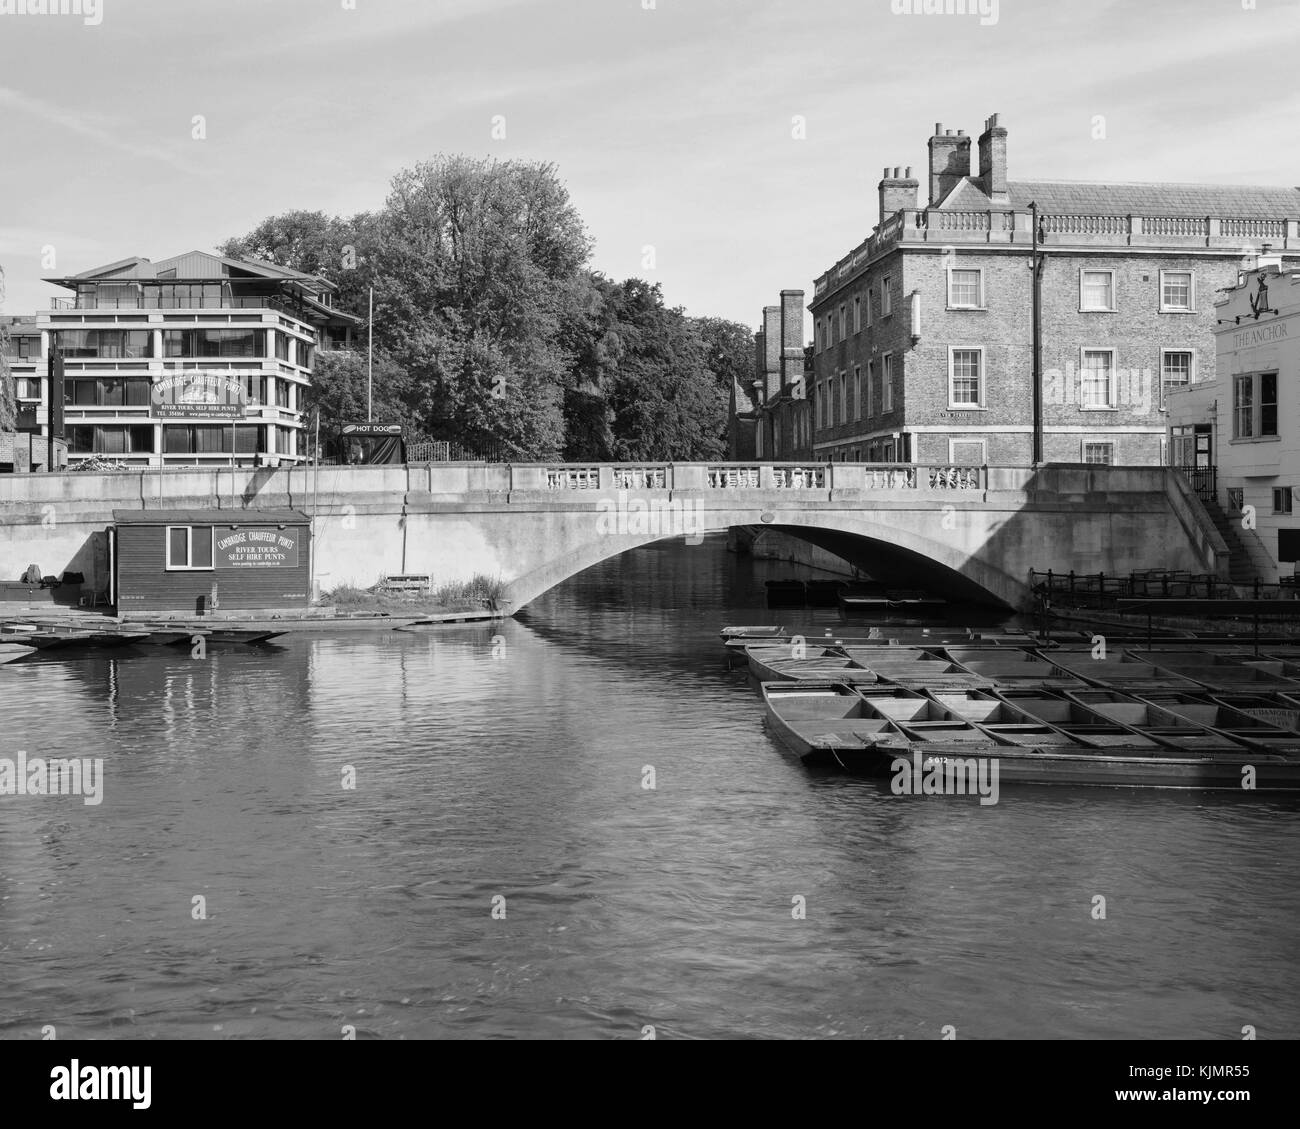 Silver Street Bridge over the River Cam in Cambridge - Stock Image